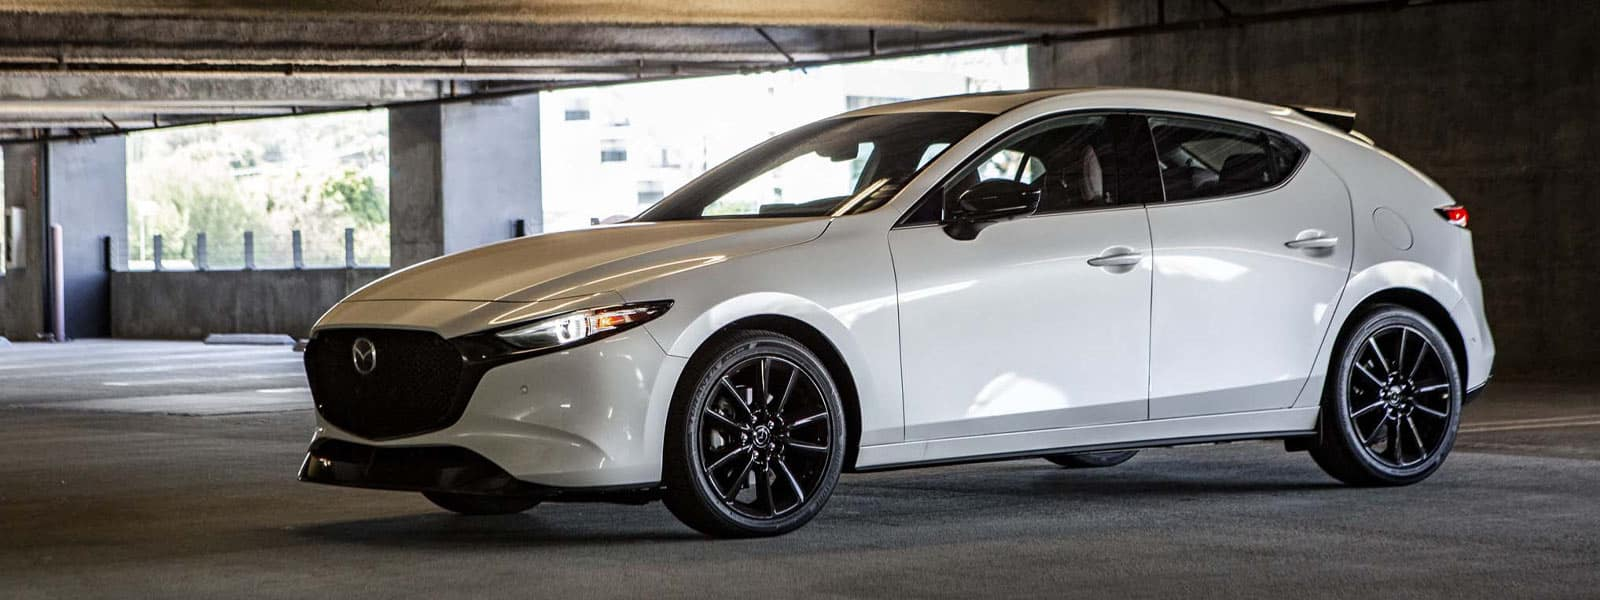 Buy or lease new Mazda3 Hatchback in Tuscaloosa Alabama